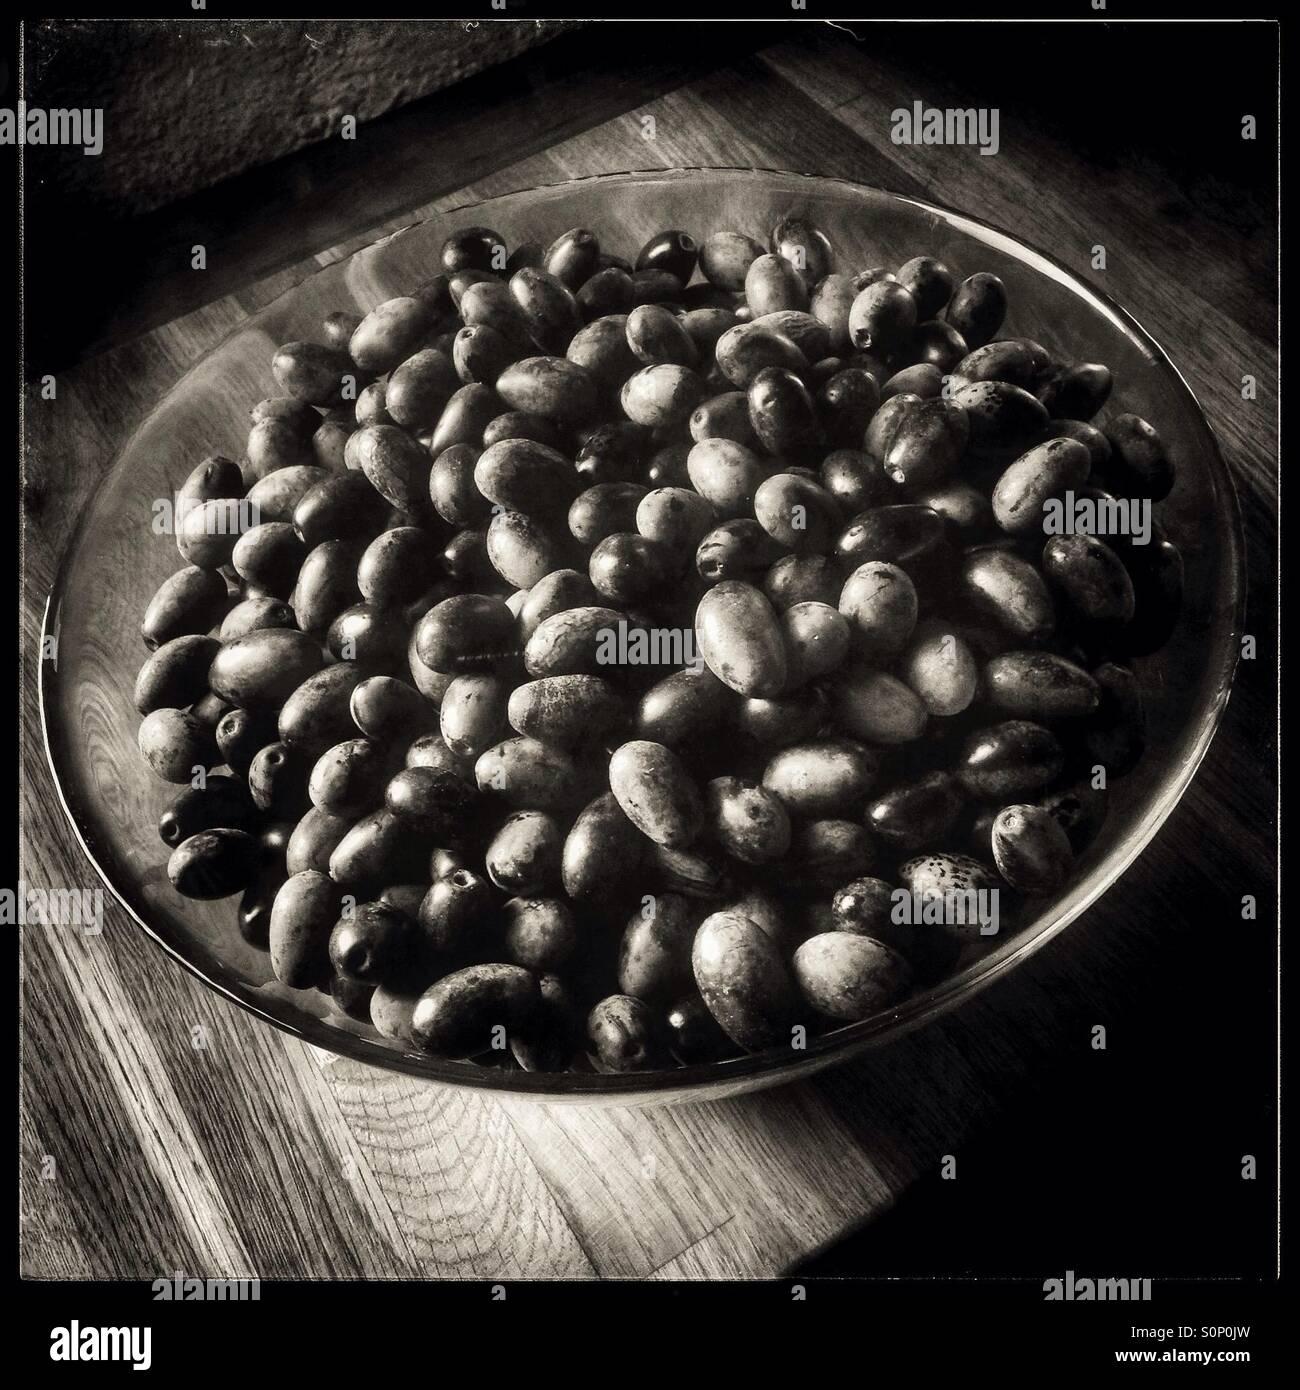 A bowl of freshly harvested black-ripe Spanish Empeltre olives ready for preserving, Catalonia, Spain - Stock Image